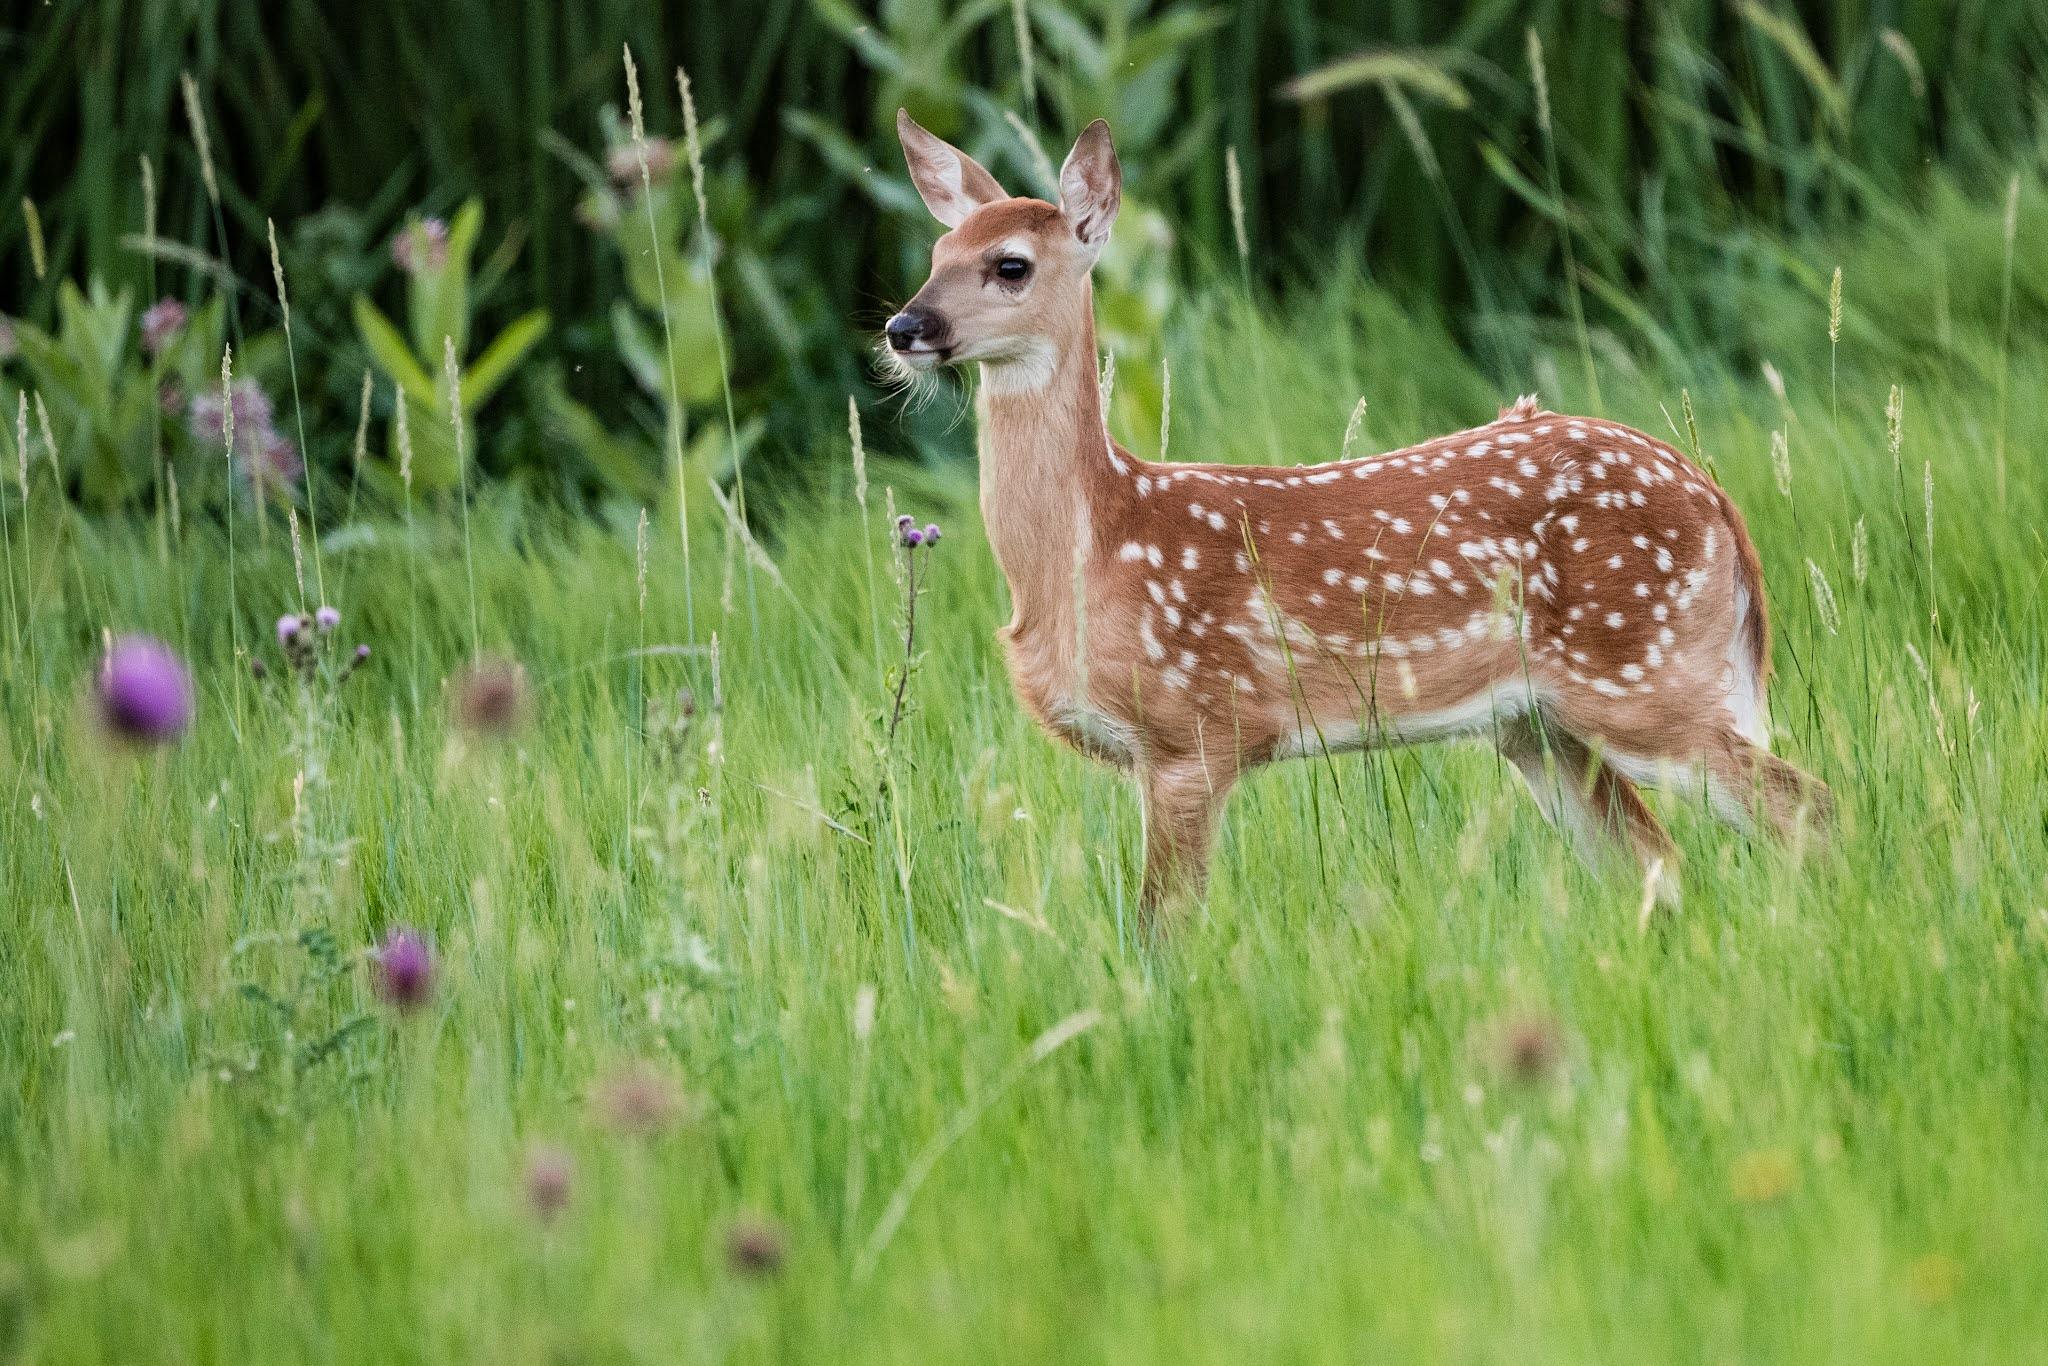 Baby Deer Fawn in Ohio